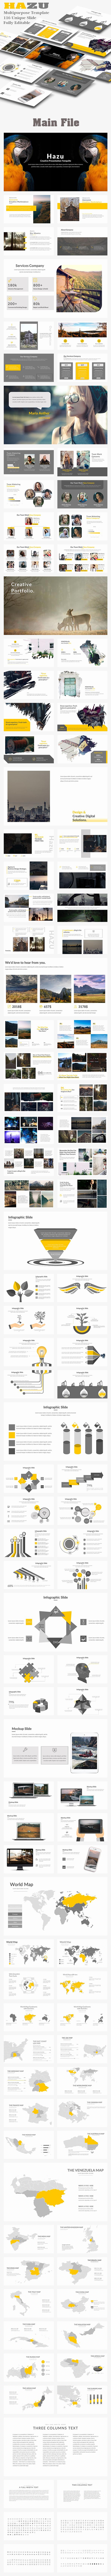 Hazu Multipurpose PowerPoint Template - Creative PowerPoint Templates